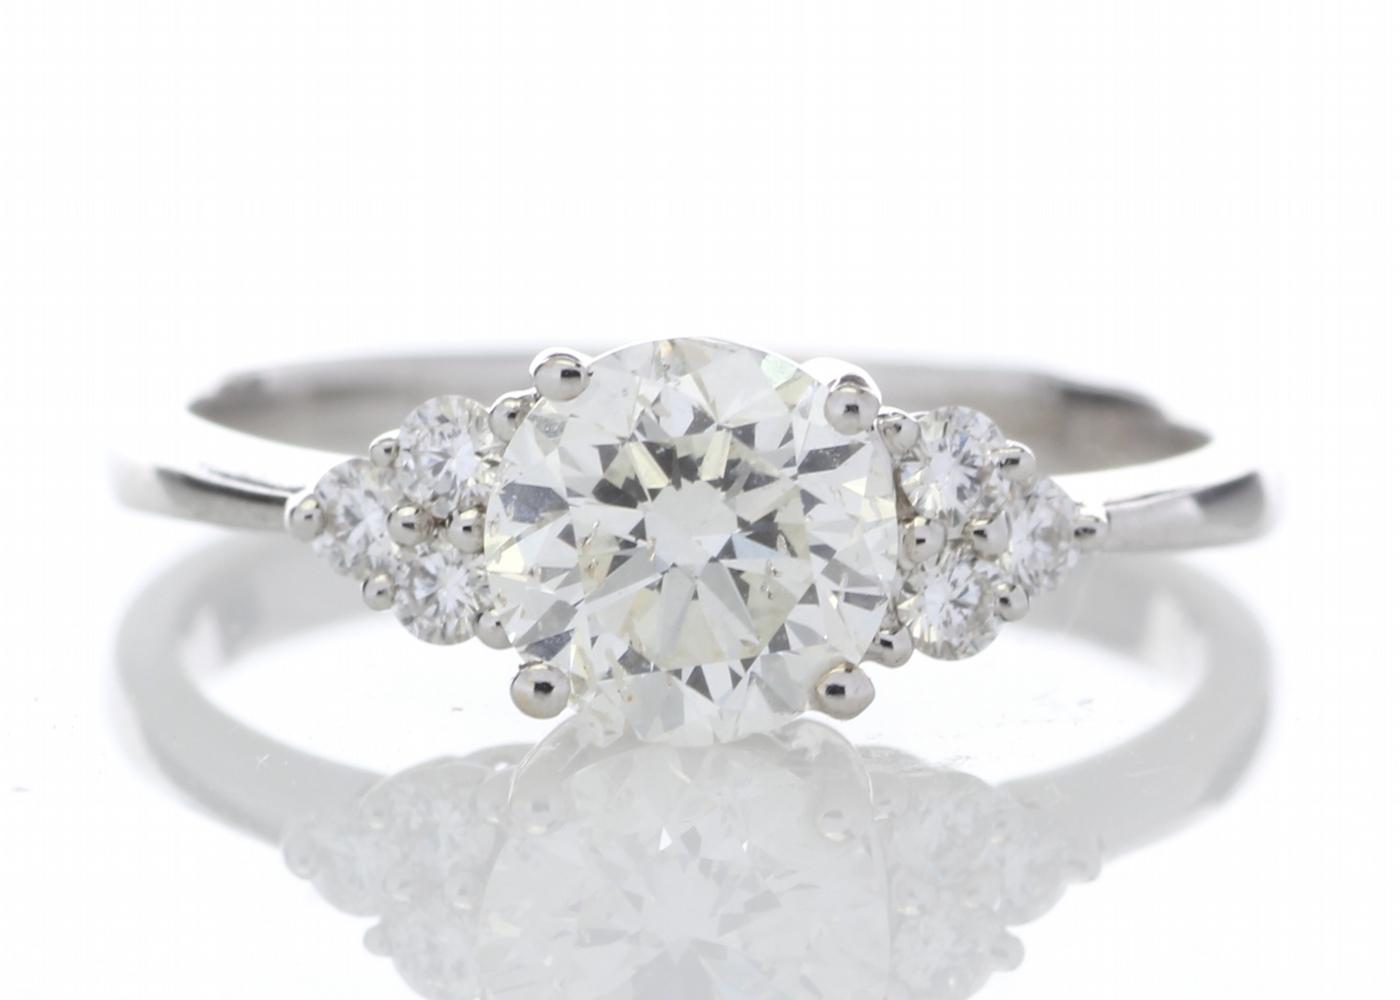 18ct White Gold Heart Shape Diamond Ring 1.29 Carats